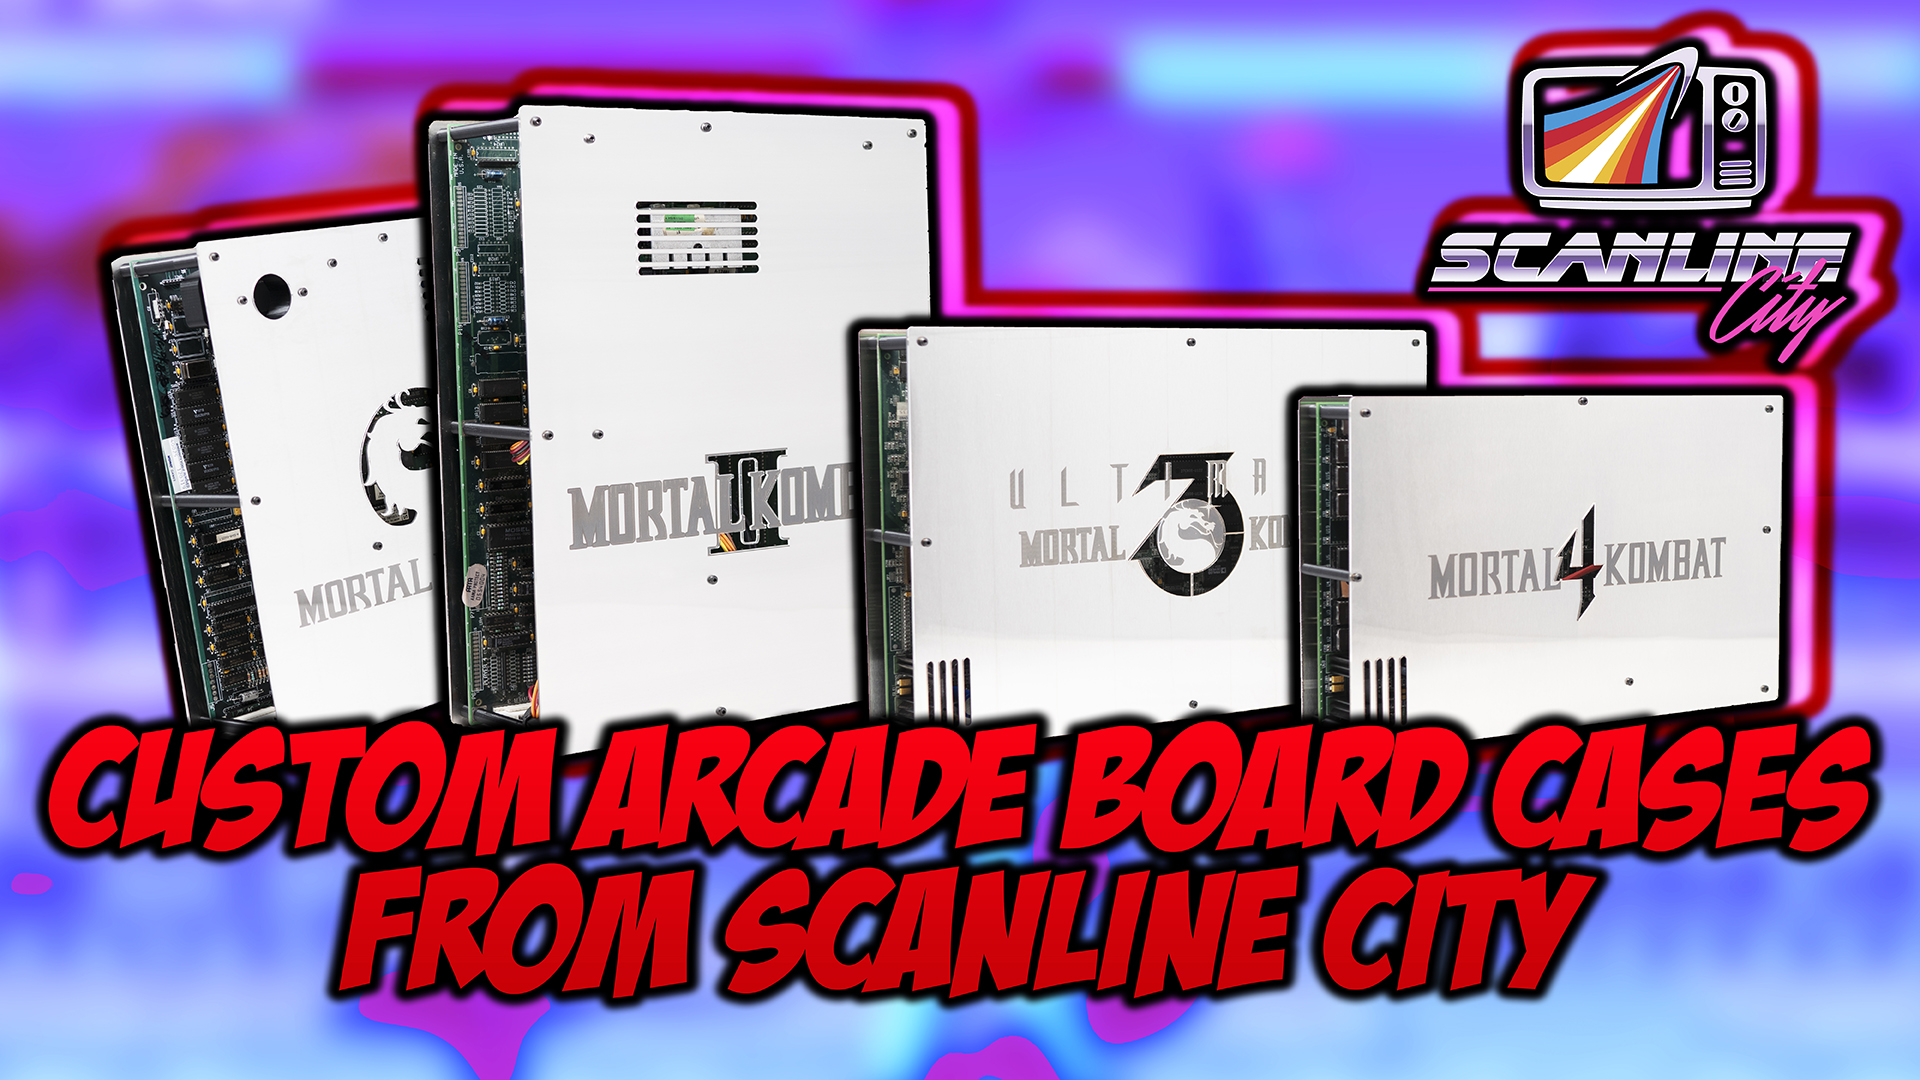 Scanline City Custom Arcade Board Cases